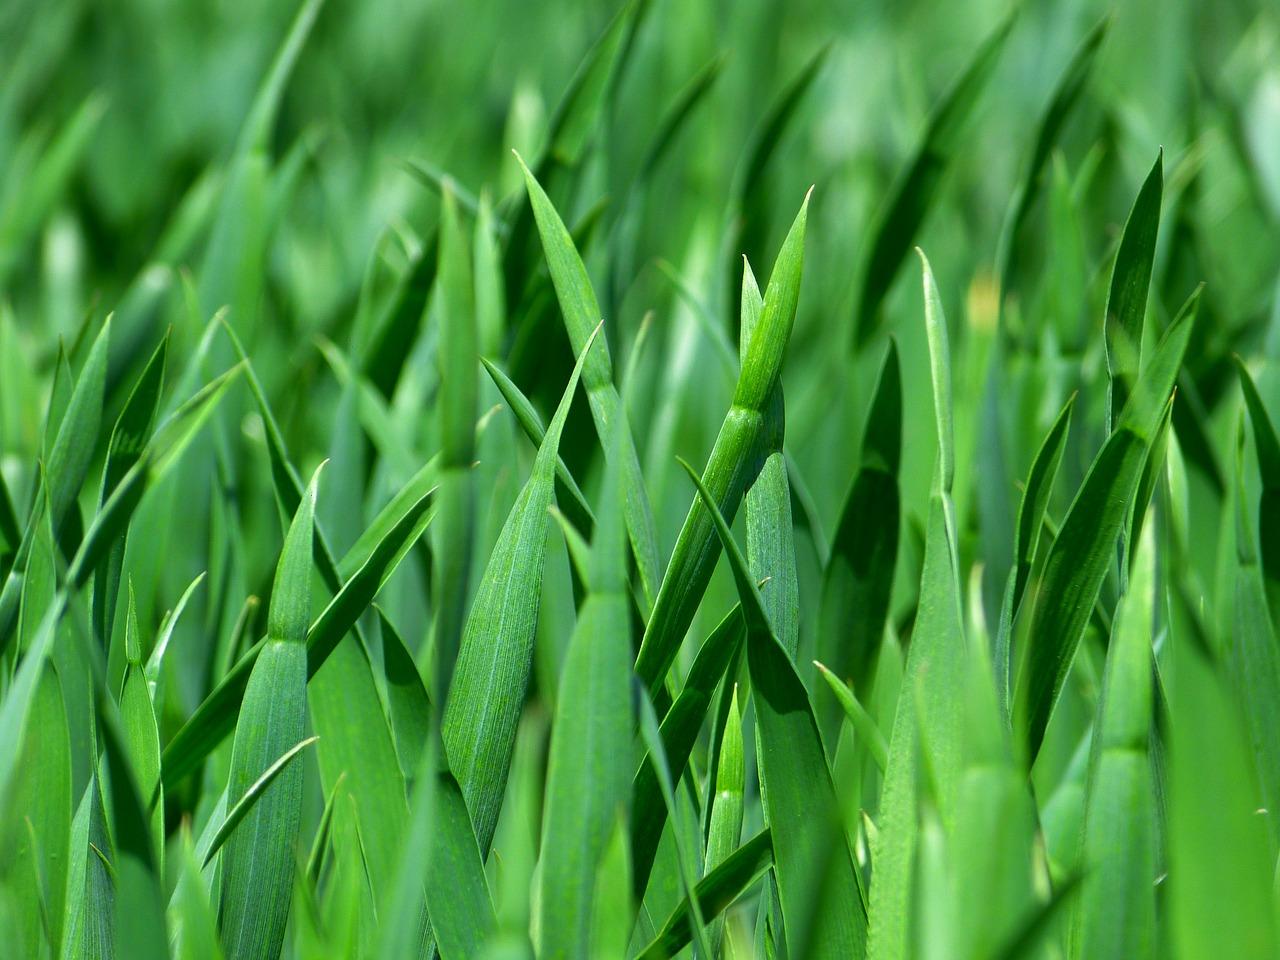 Tráva - toto není puškvorec